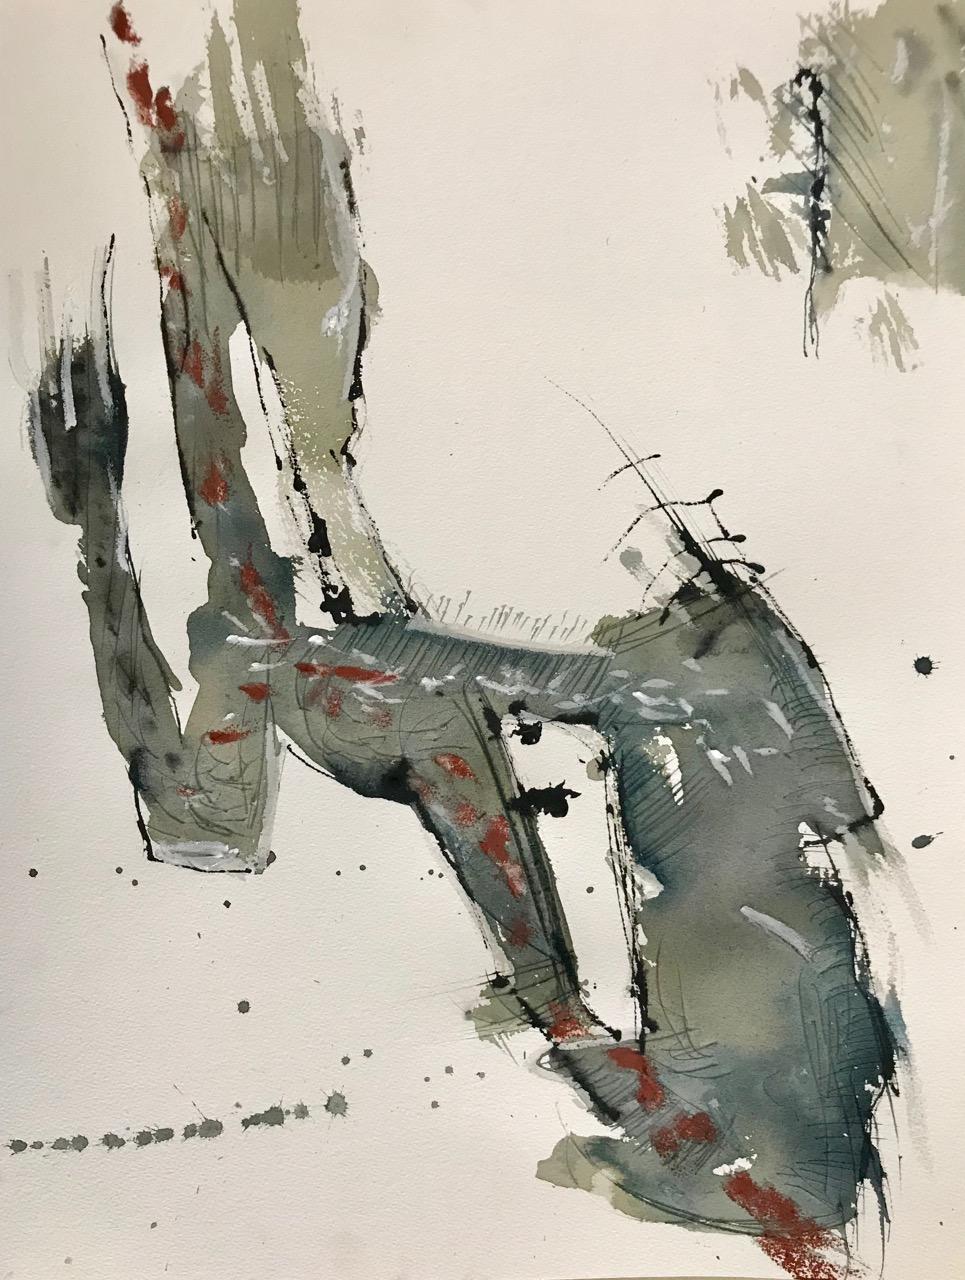 Hi There!, Aquarell und Tusche auf Papier, 46 x 61 cm, 2018